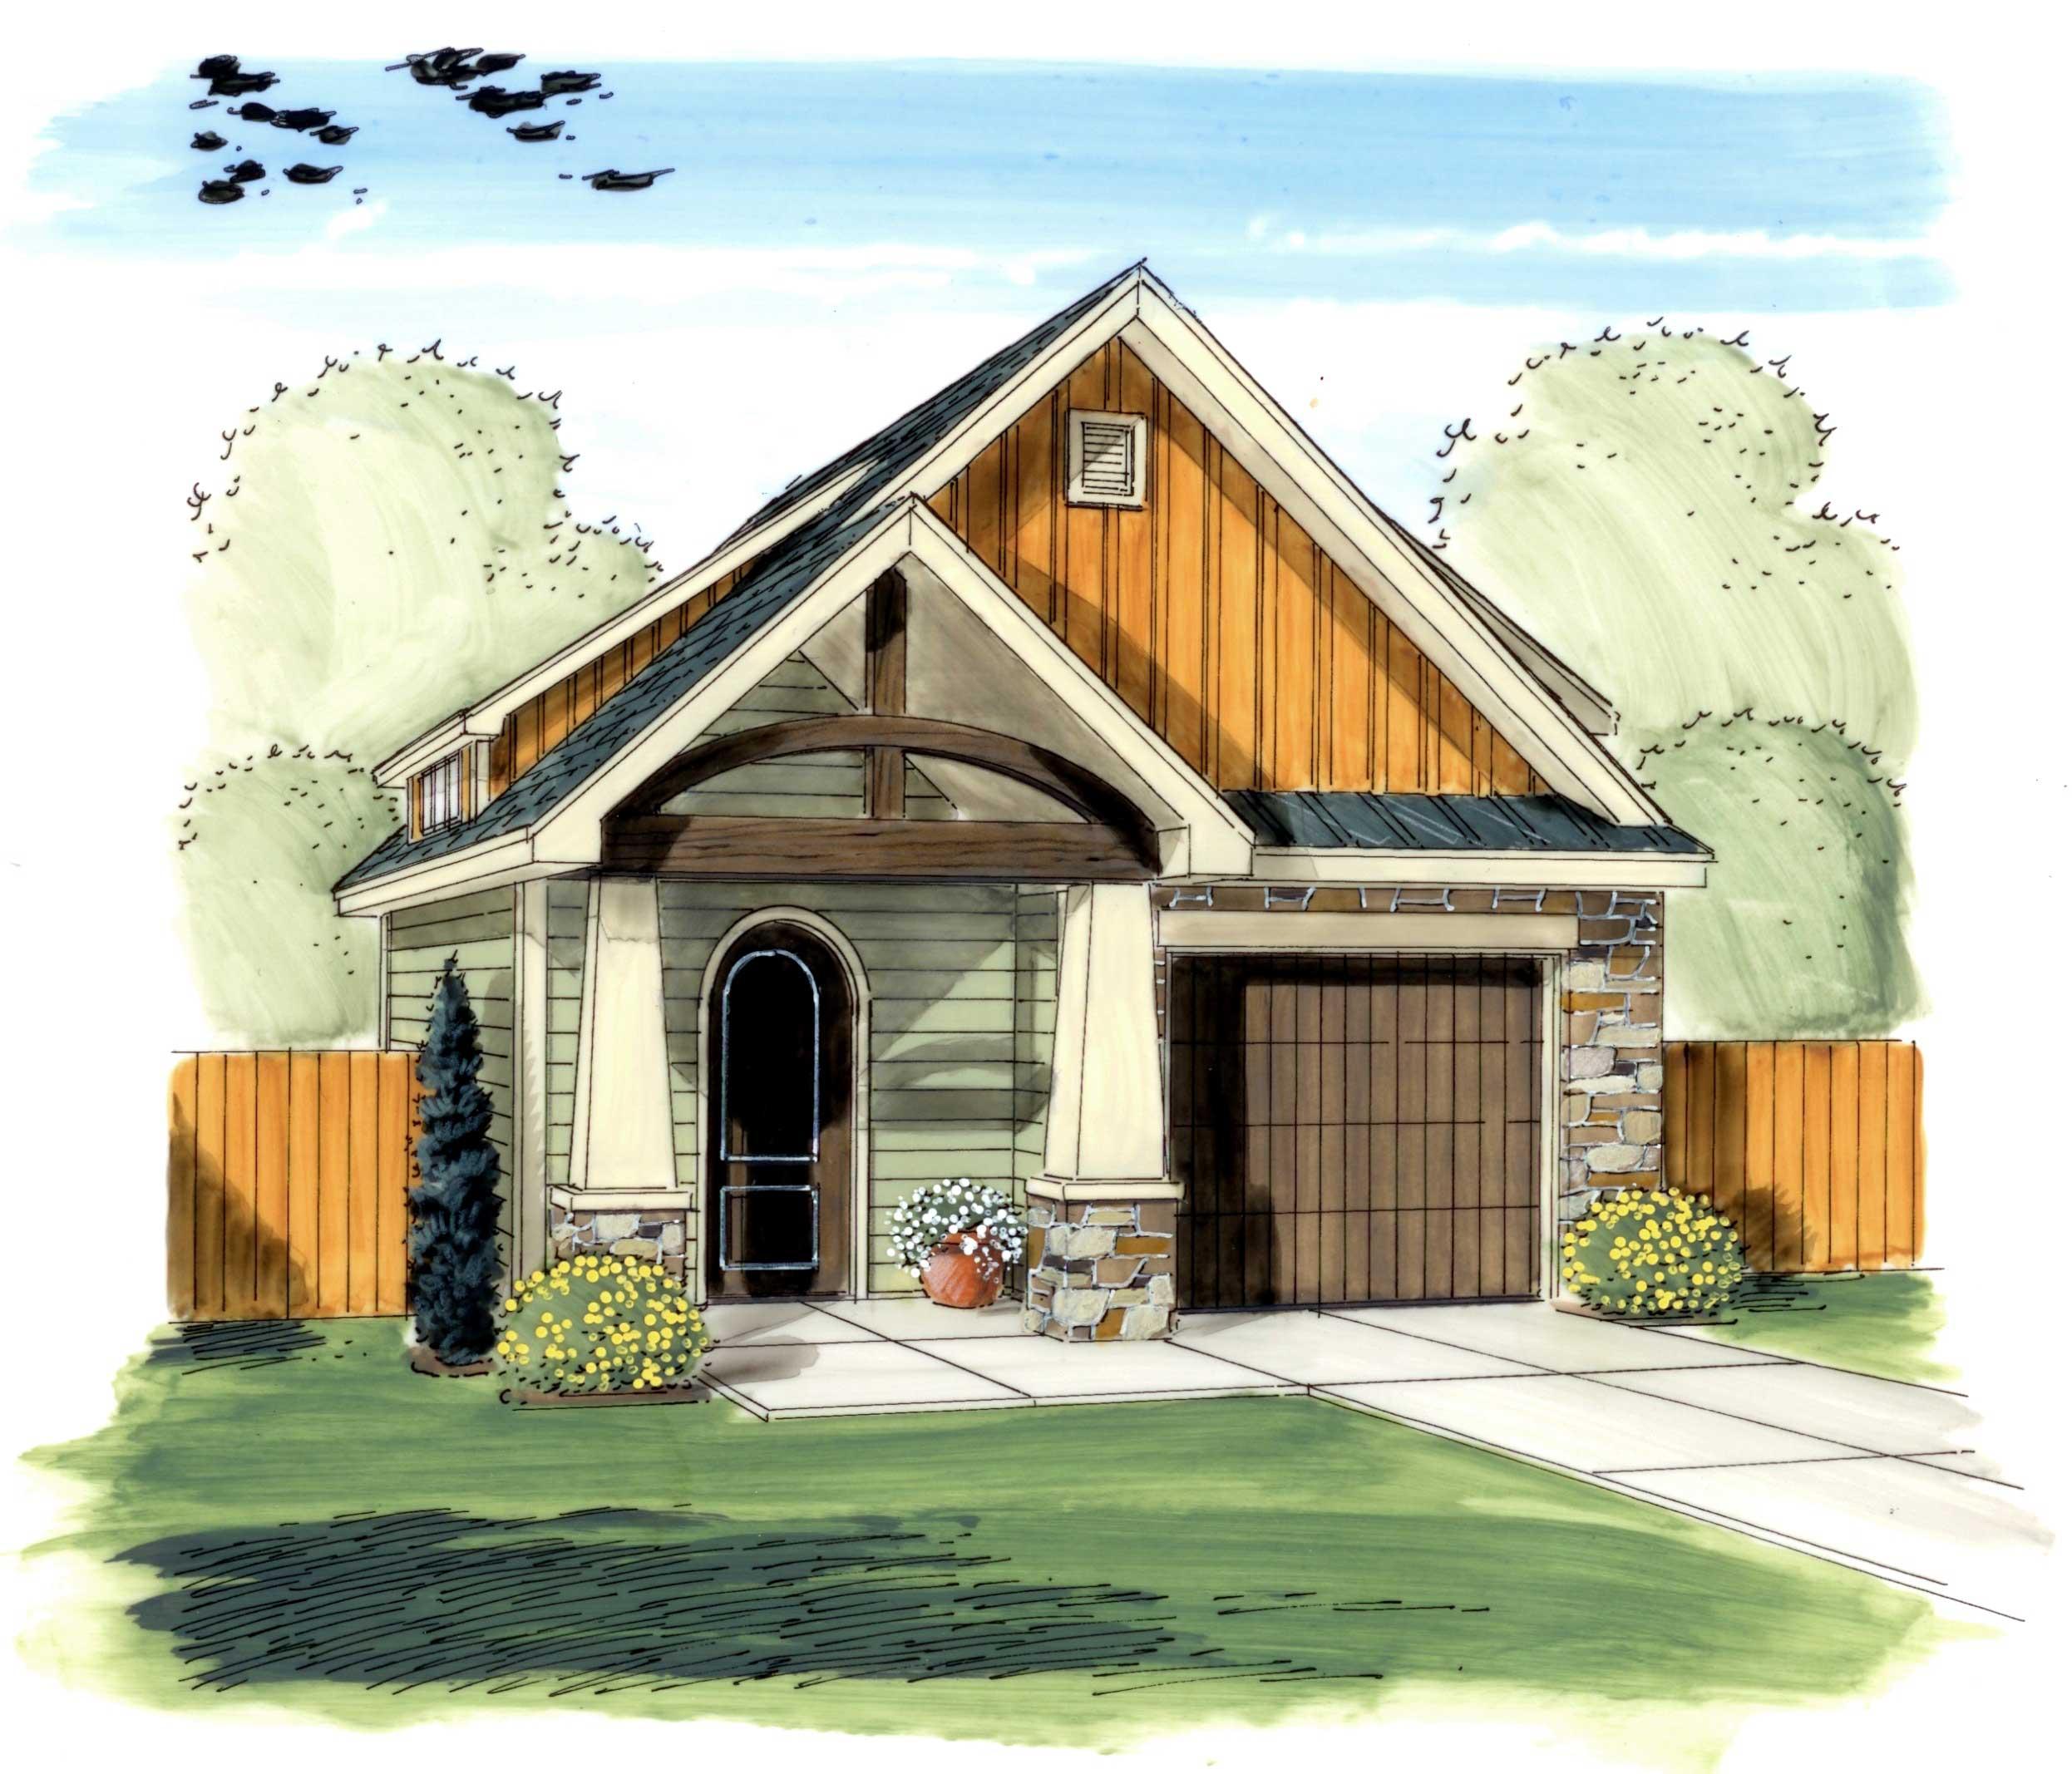 Craftsman Style Det Garage Garage Plans: Garage Style Garage With 1 Car, 0 Bedroom, 626 Sq Ft